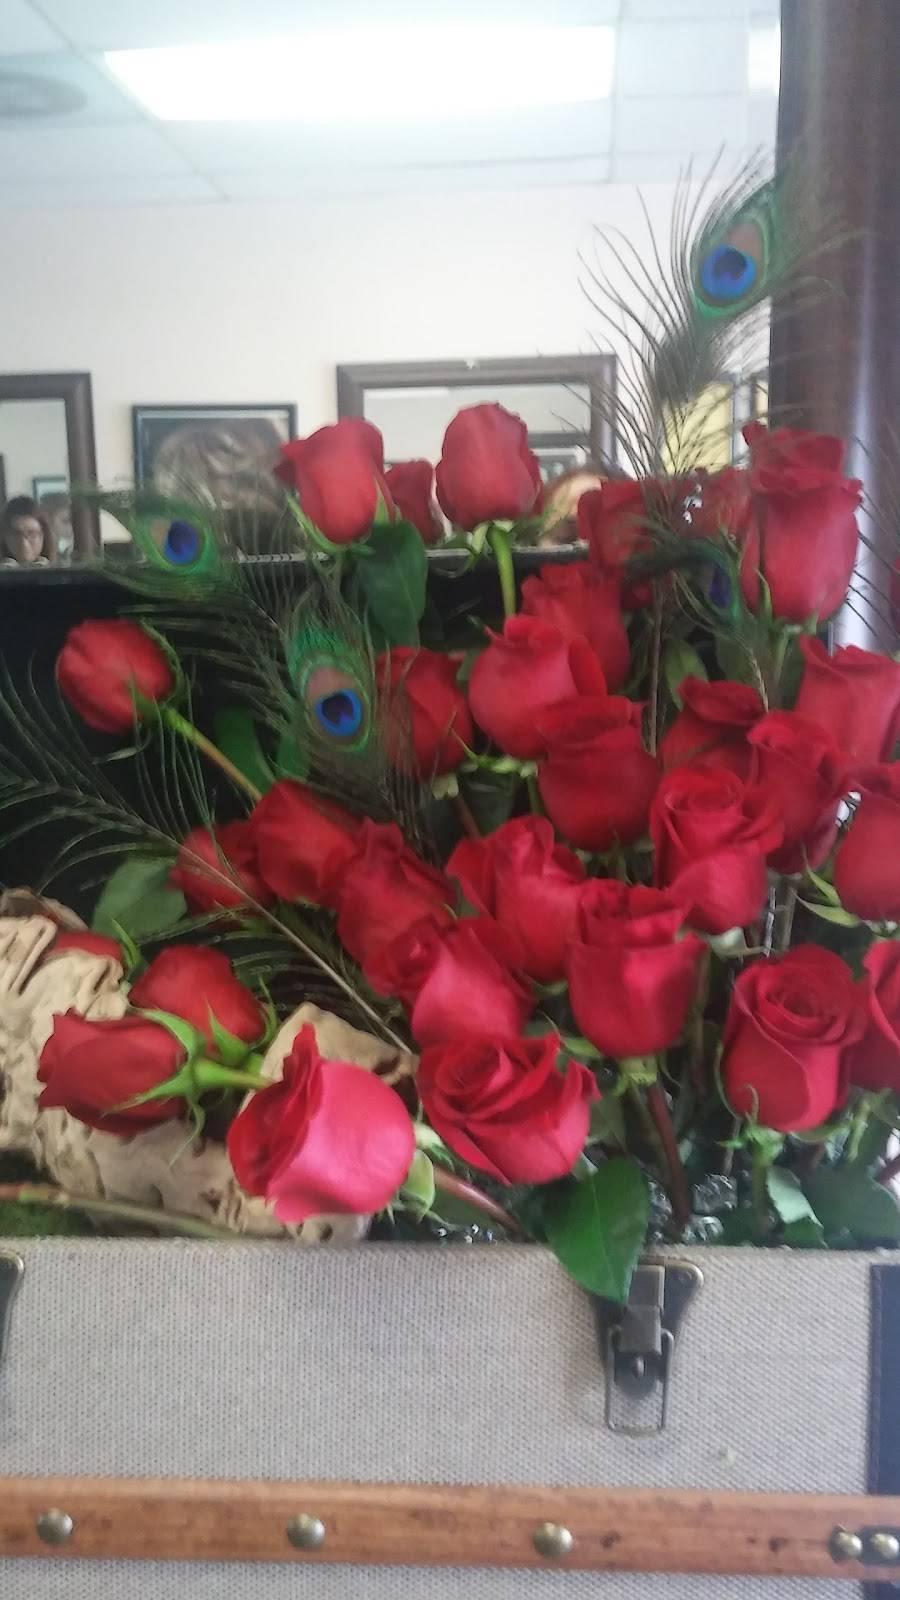 BELLA ROSE - florist  | Photo 4 of 6 | Address: 303 Foothill Blvd, Rialto, CA 92376, USA | Phone: (909) 820-9630